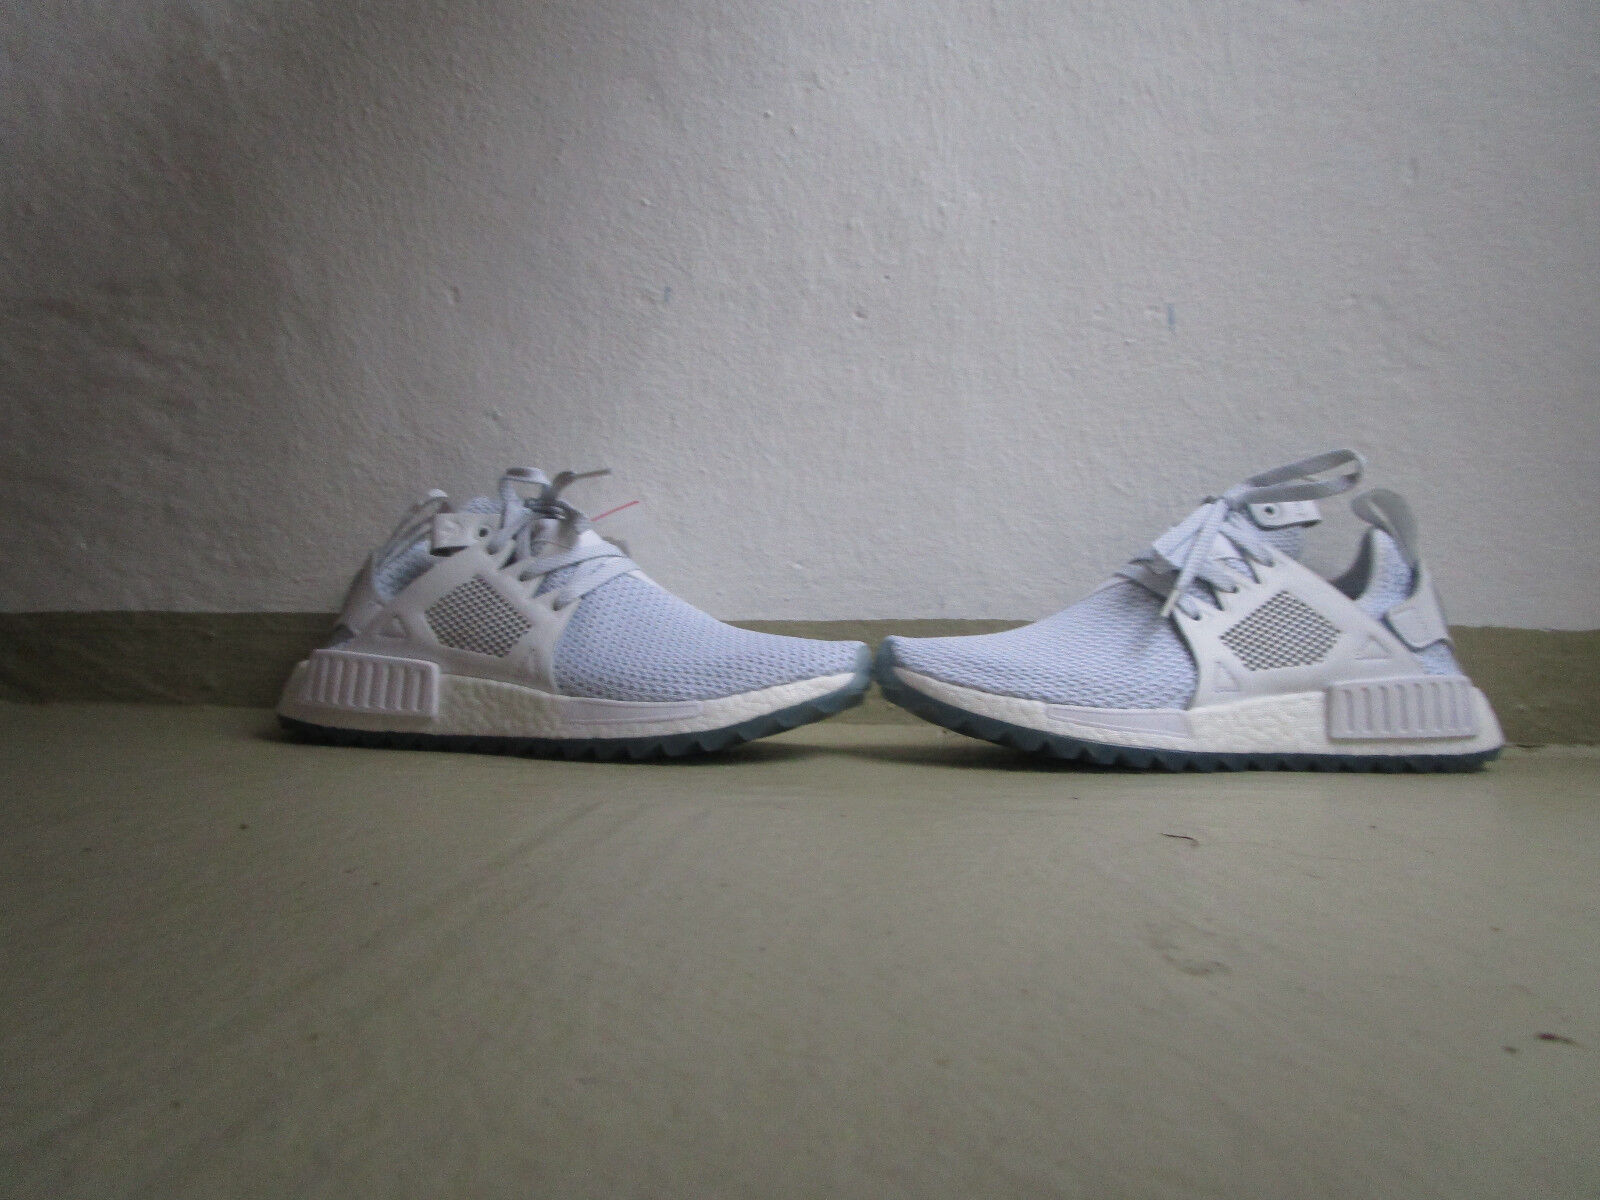 Adidas Consortium x Titolo NMD XR1 Trail Runner Boost Boost Boost 45 1/3 Light bleu/blanc 4f5d34